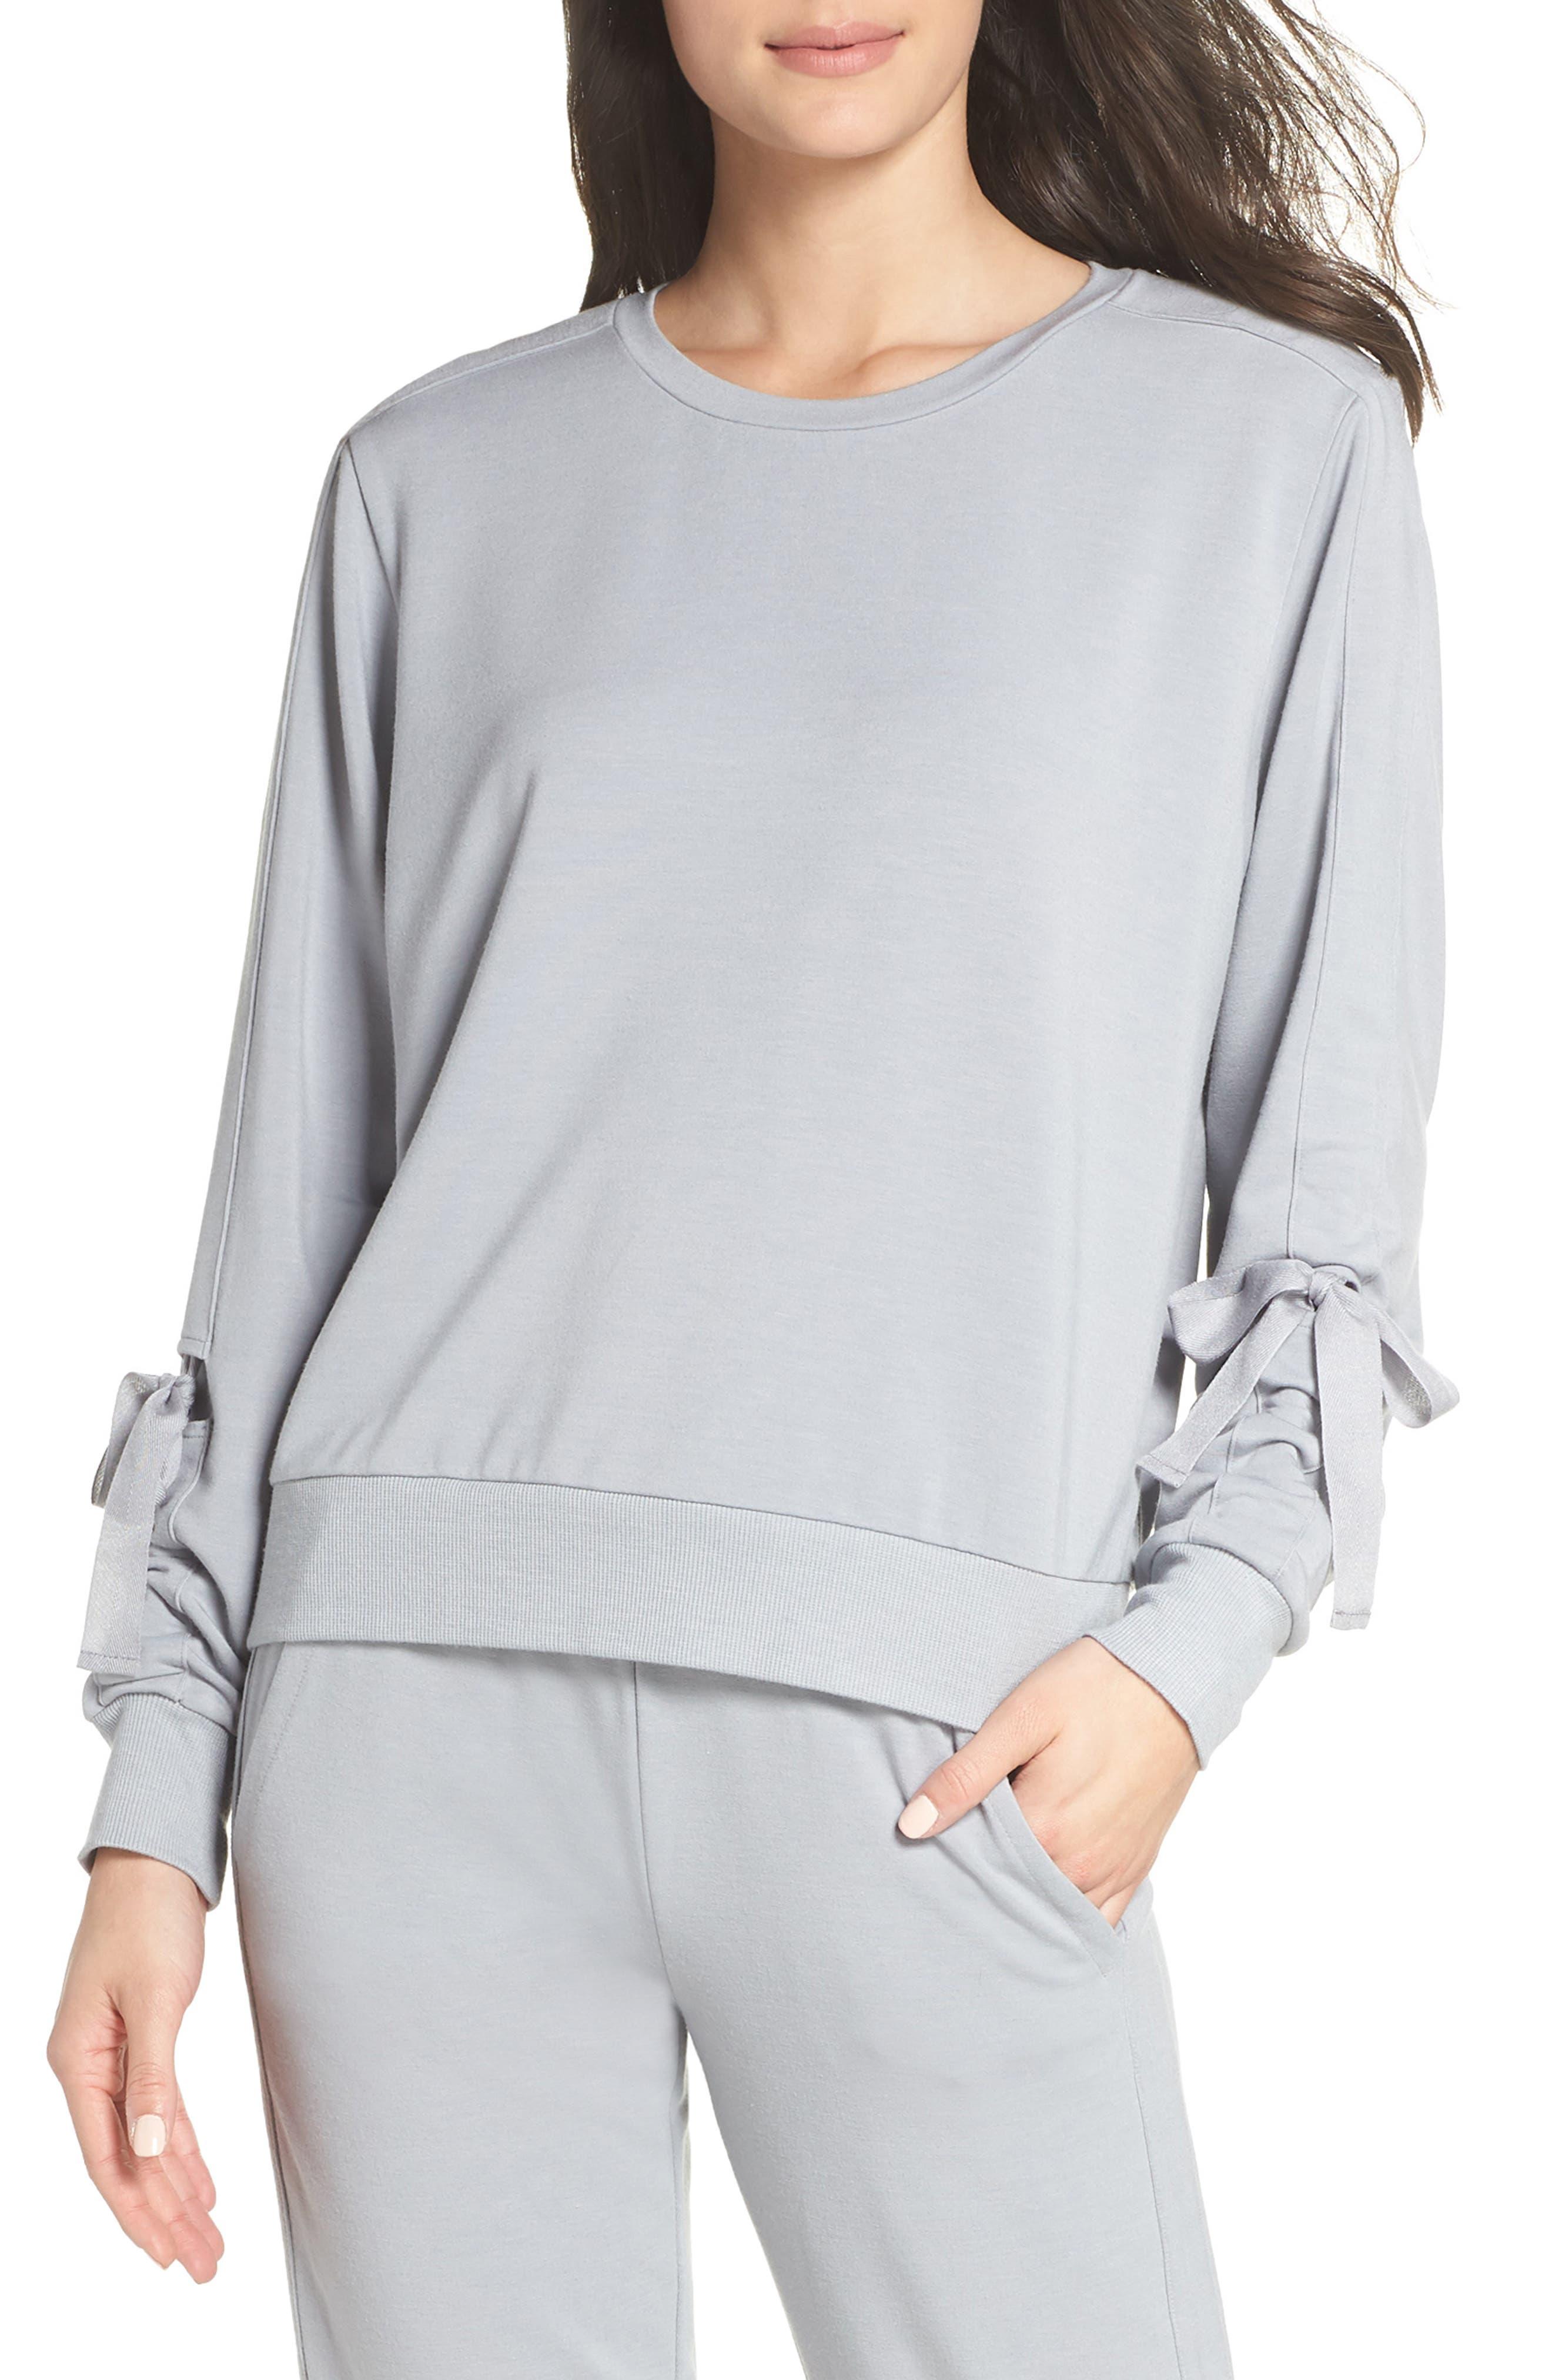 Gather Sleeve Sweatshirt,                             Main thumbnail 1, color,                             GREY WOLF